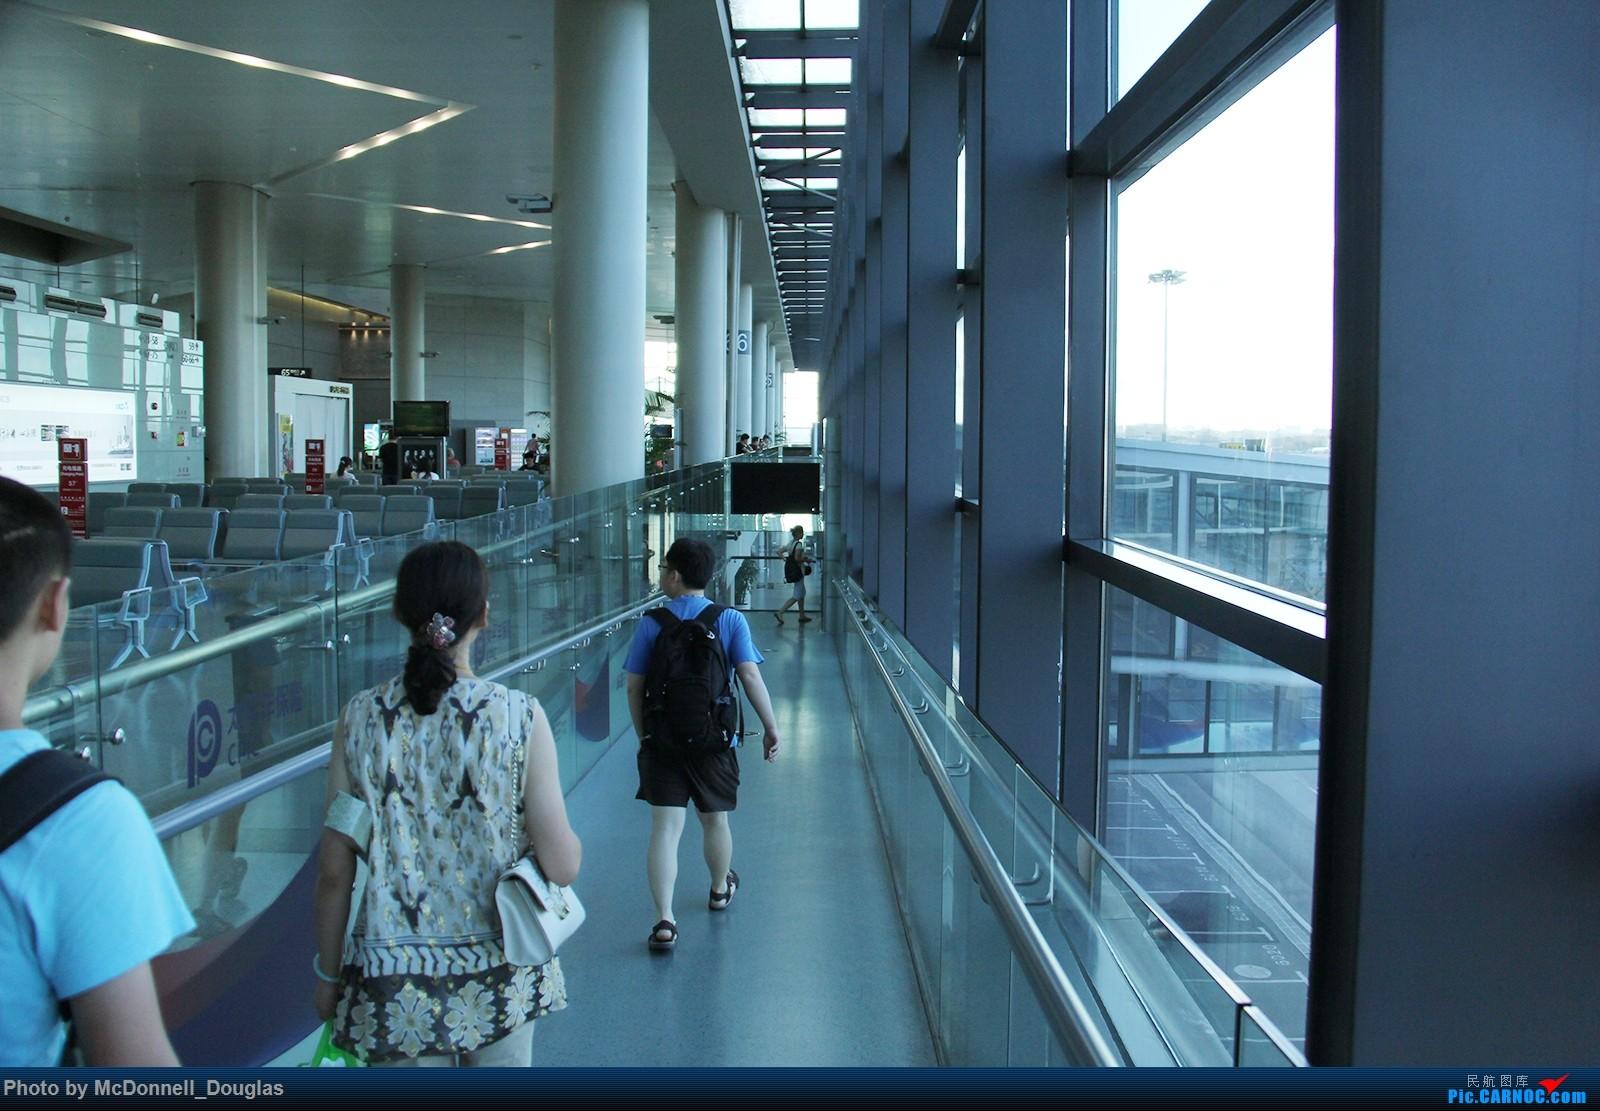 Re:[原创]【上海飞友会】【zc带你走天下(2)】再访祖辈年轻时工作的土地,父母年少时生活戈壁,跨越大半个中国去看新疆,回程小游蓉城(上)    中国上海虹桥国际机场